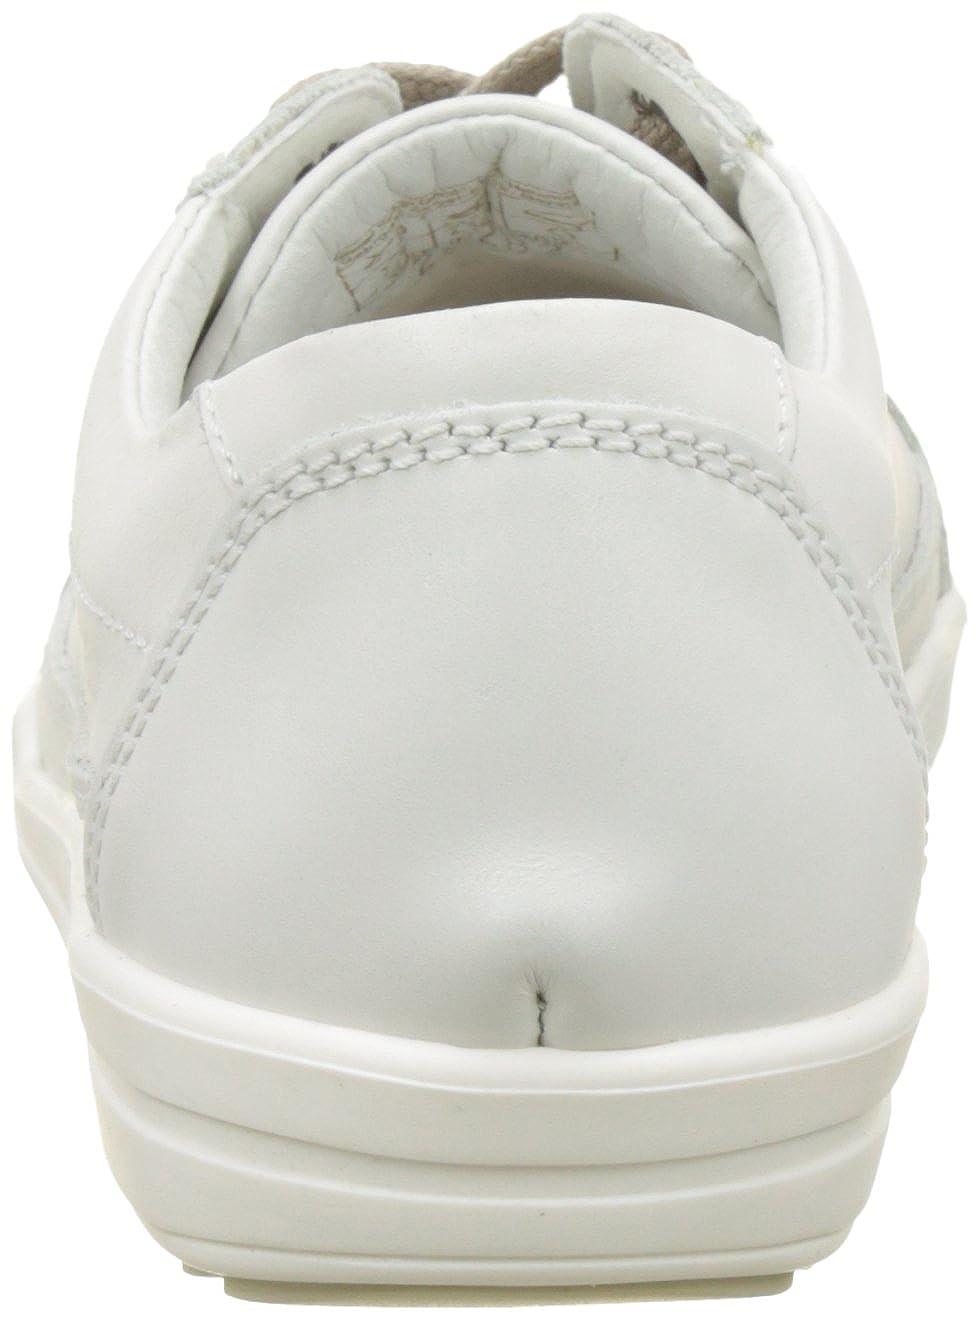 Trainers Shoes co amp; Bags Women's uk 63 Smu Josef Dany Seibel Amazon 4wq47F